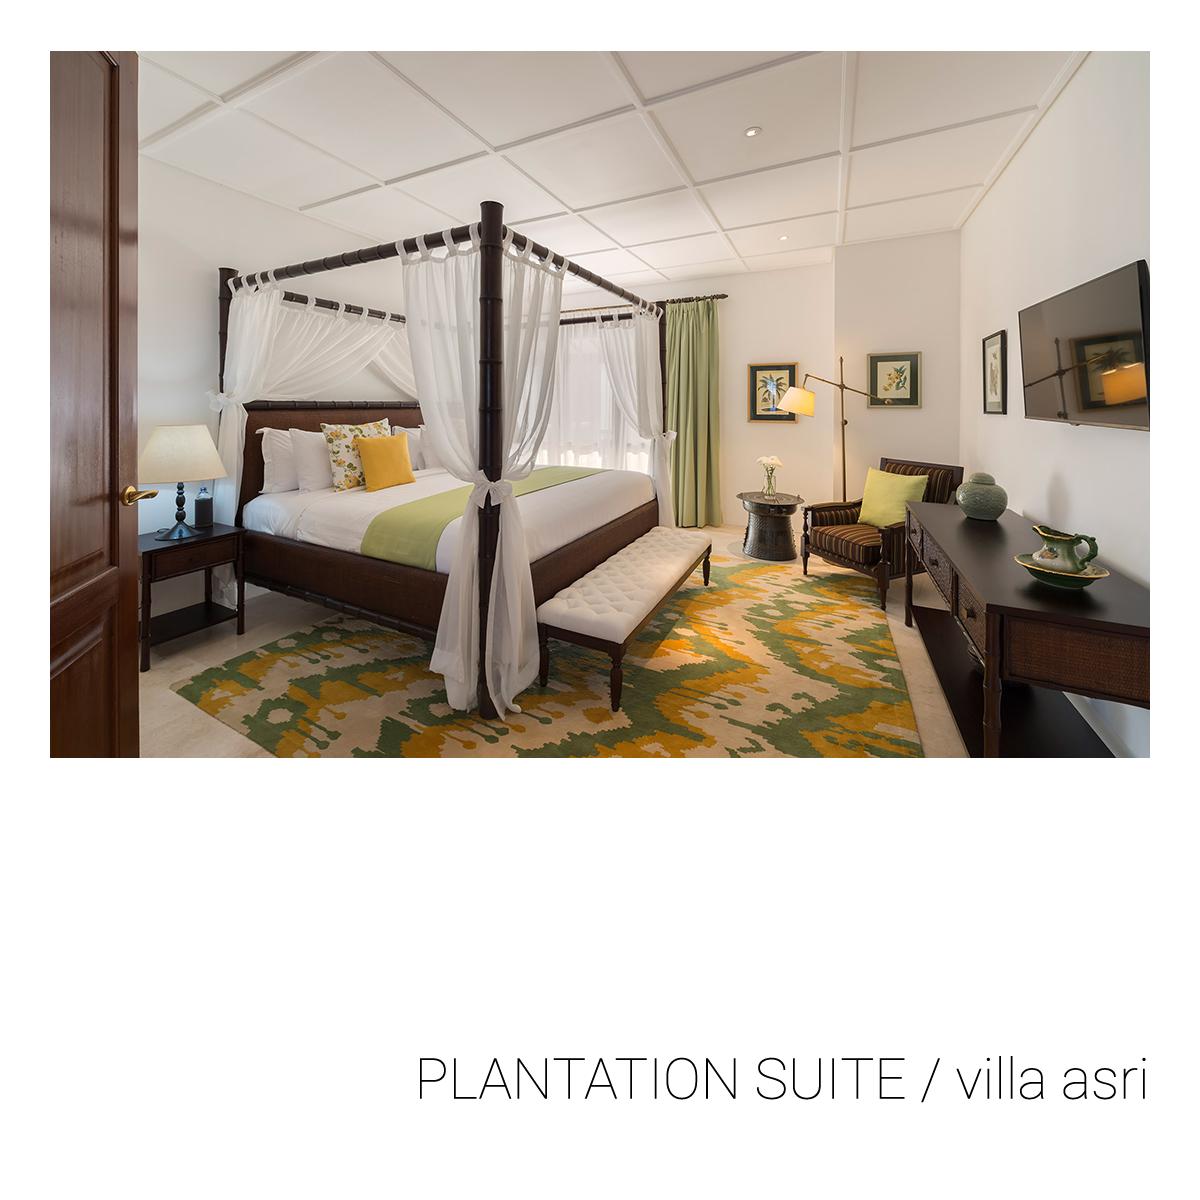 Plantation Suite VILLA ASRI